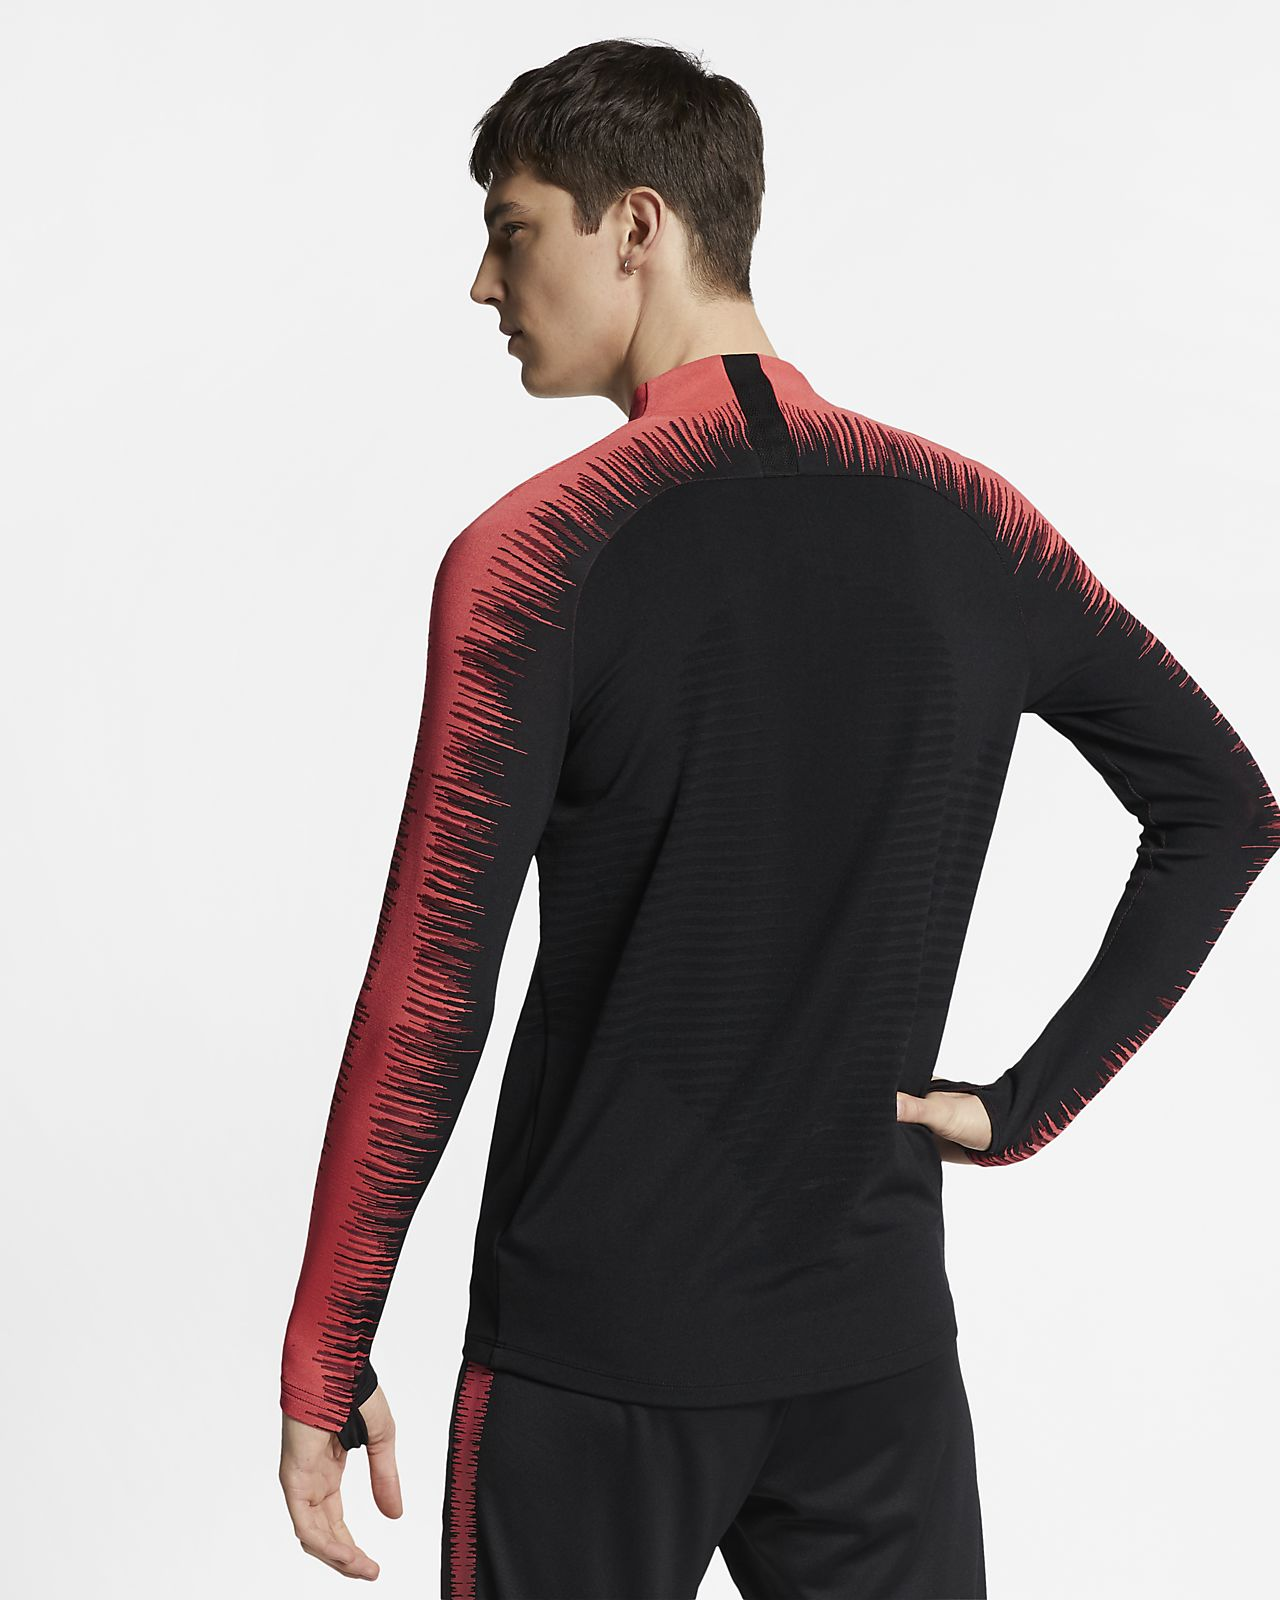 630b815c Nike VaporKnit Strike Men's Long-Sleeve Football Top. Nike.com DK